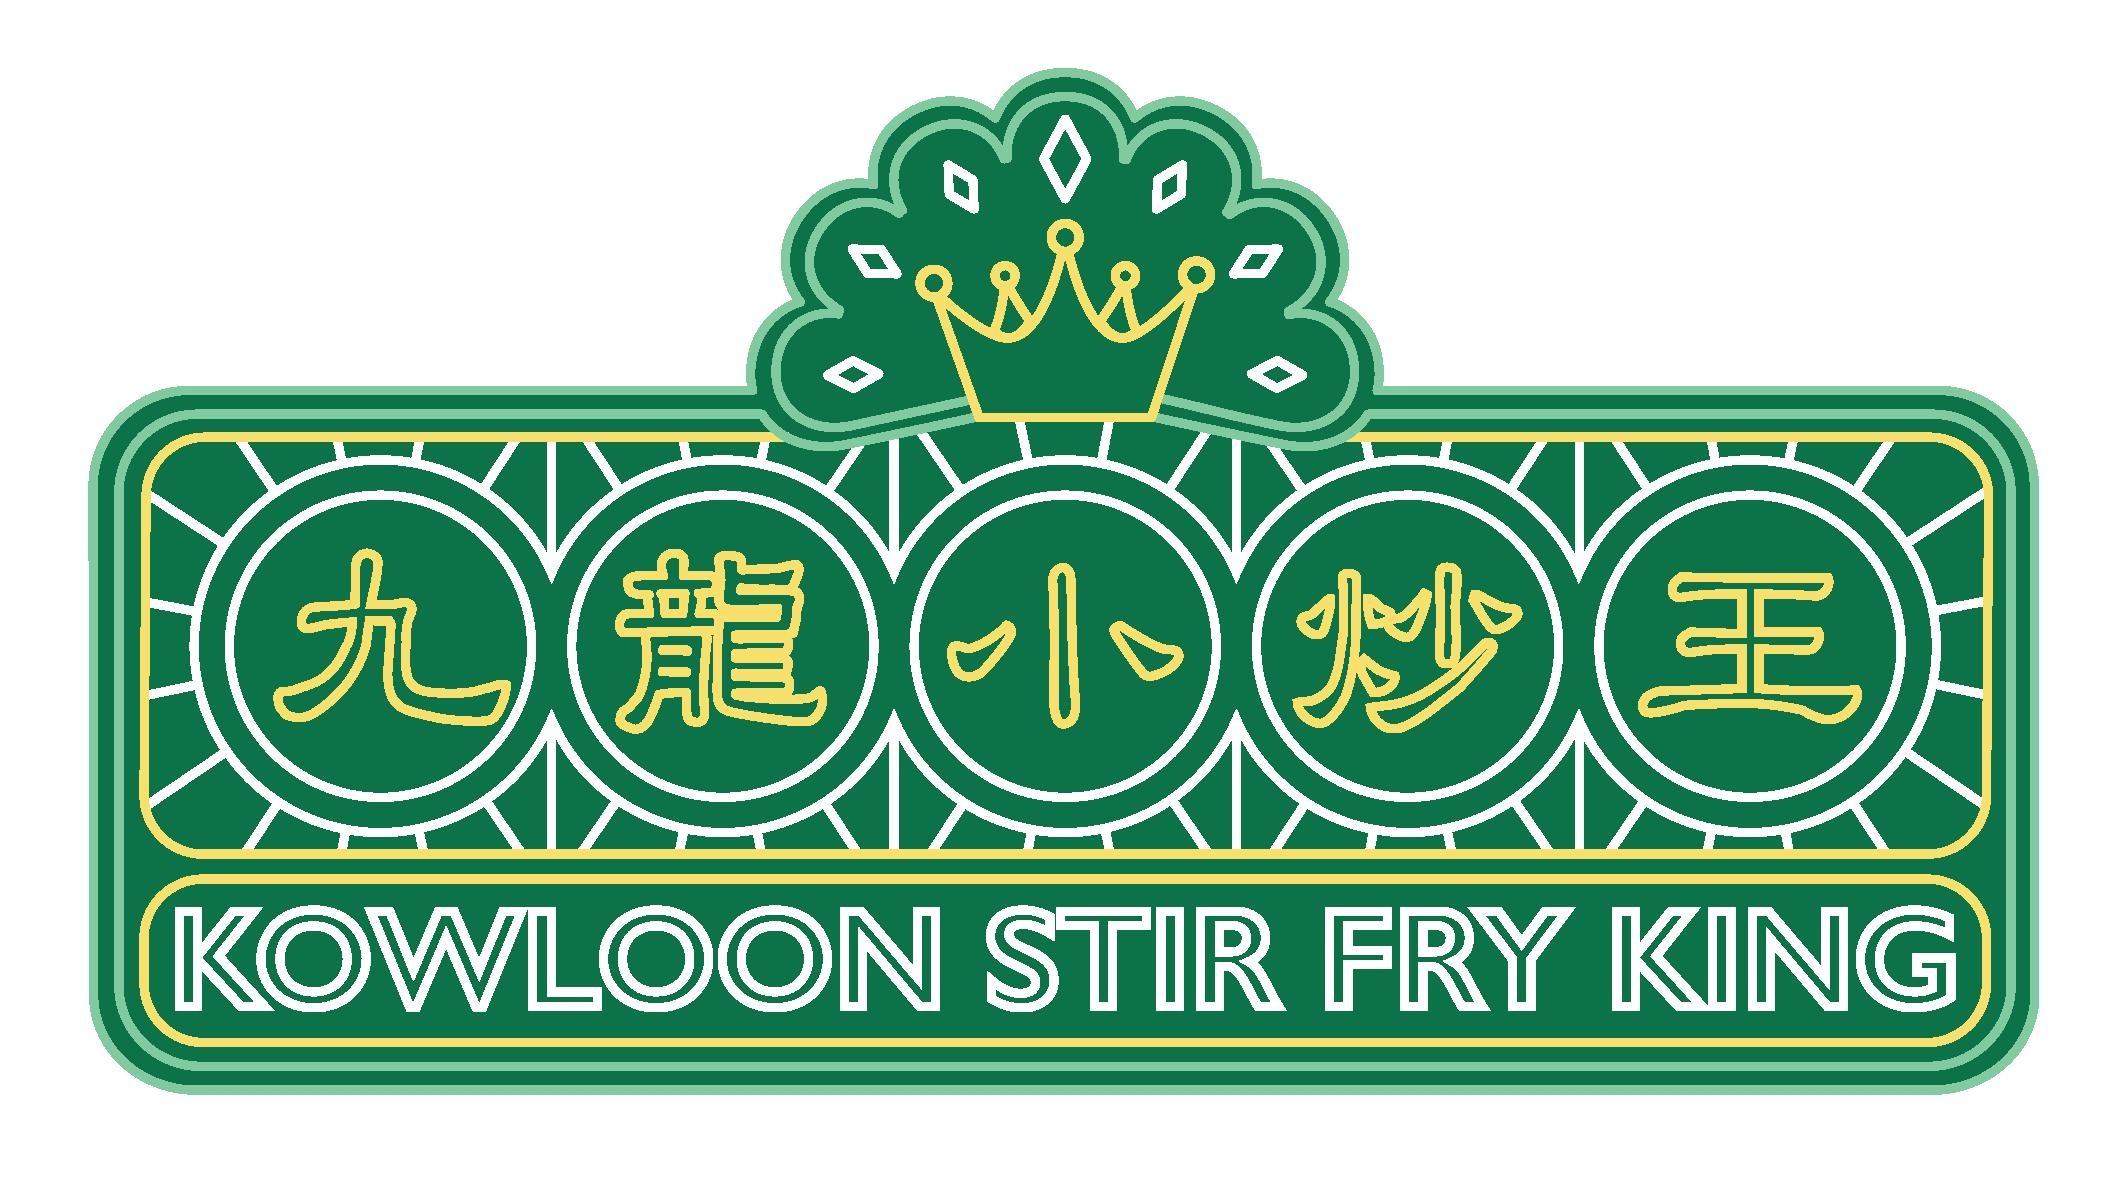 Kowloon Stir Fry King